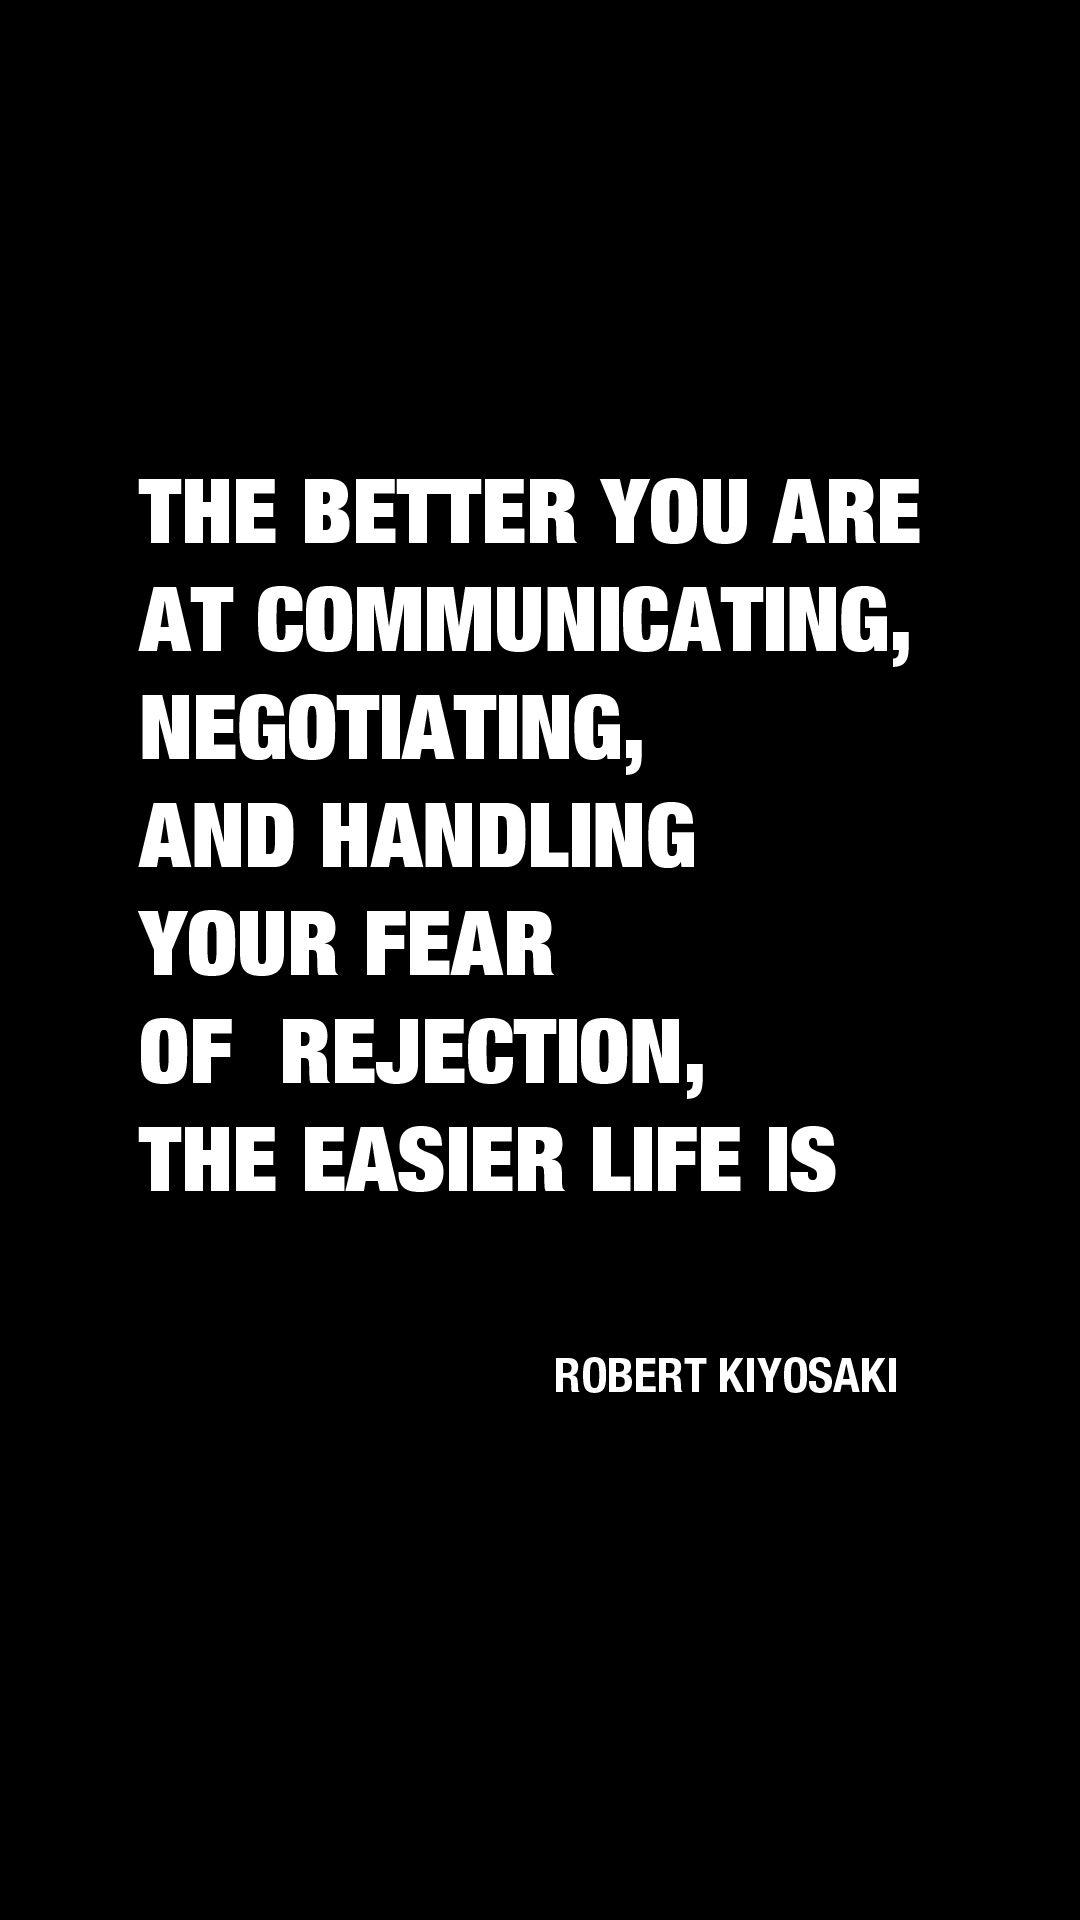 Robert Kiyosaki Business Motivation Motivate Quote